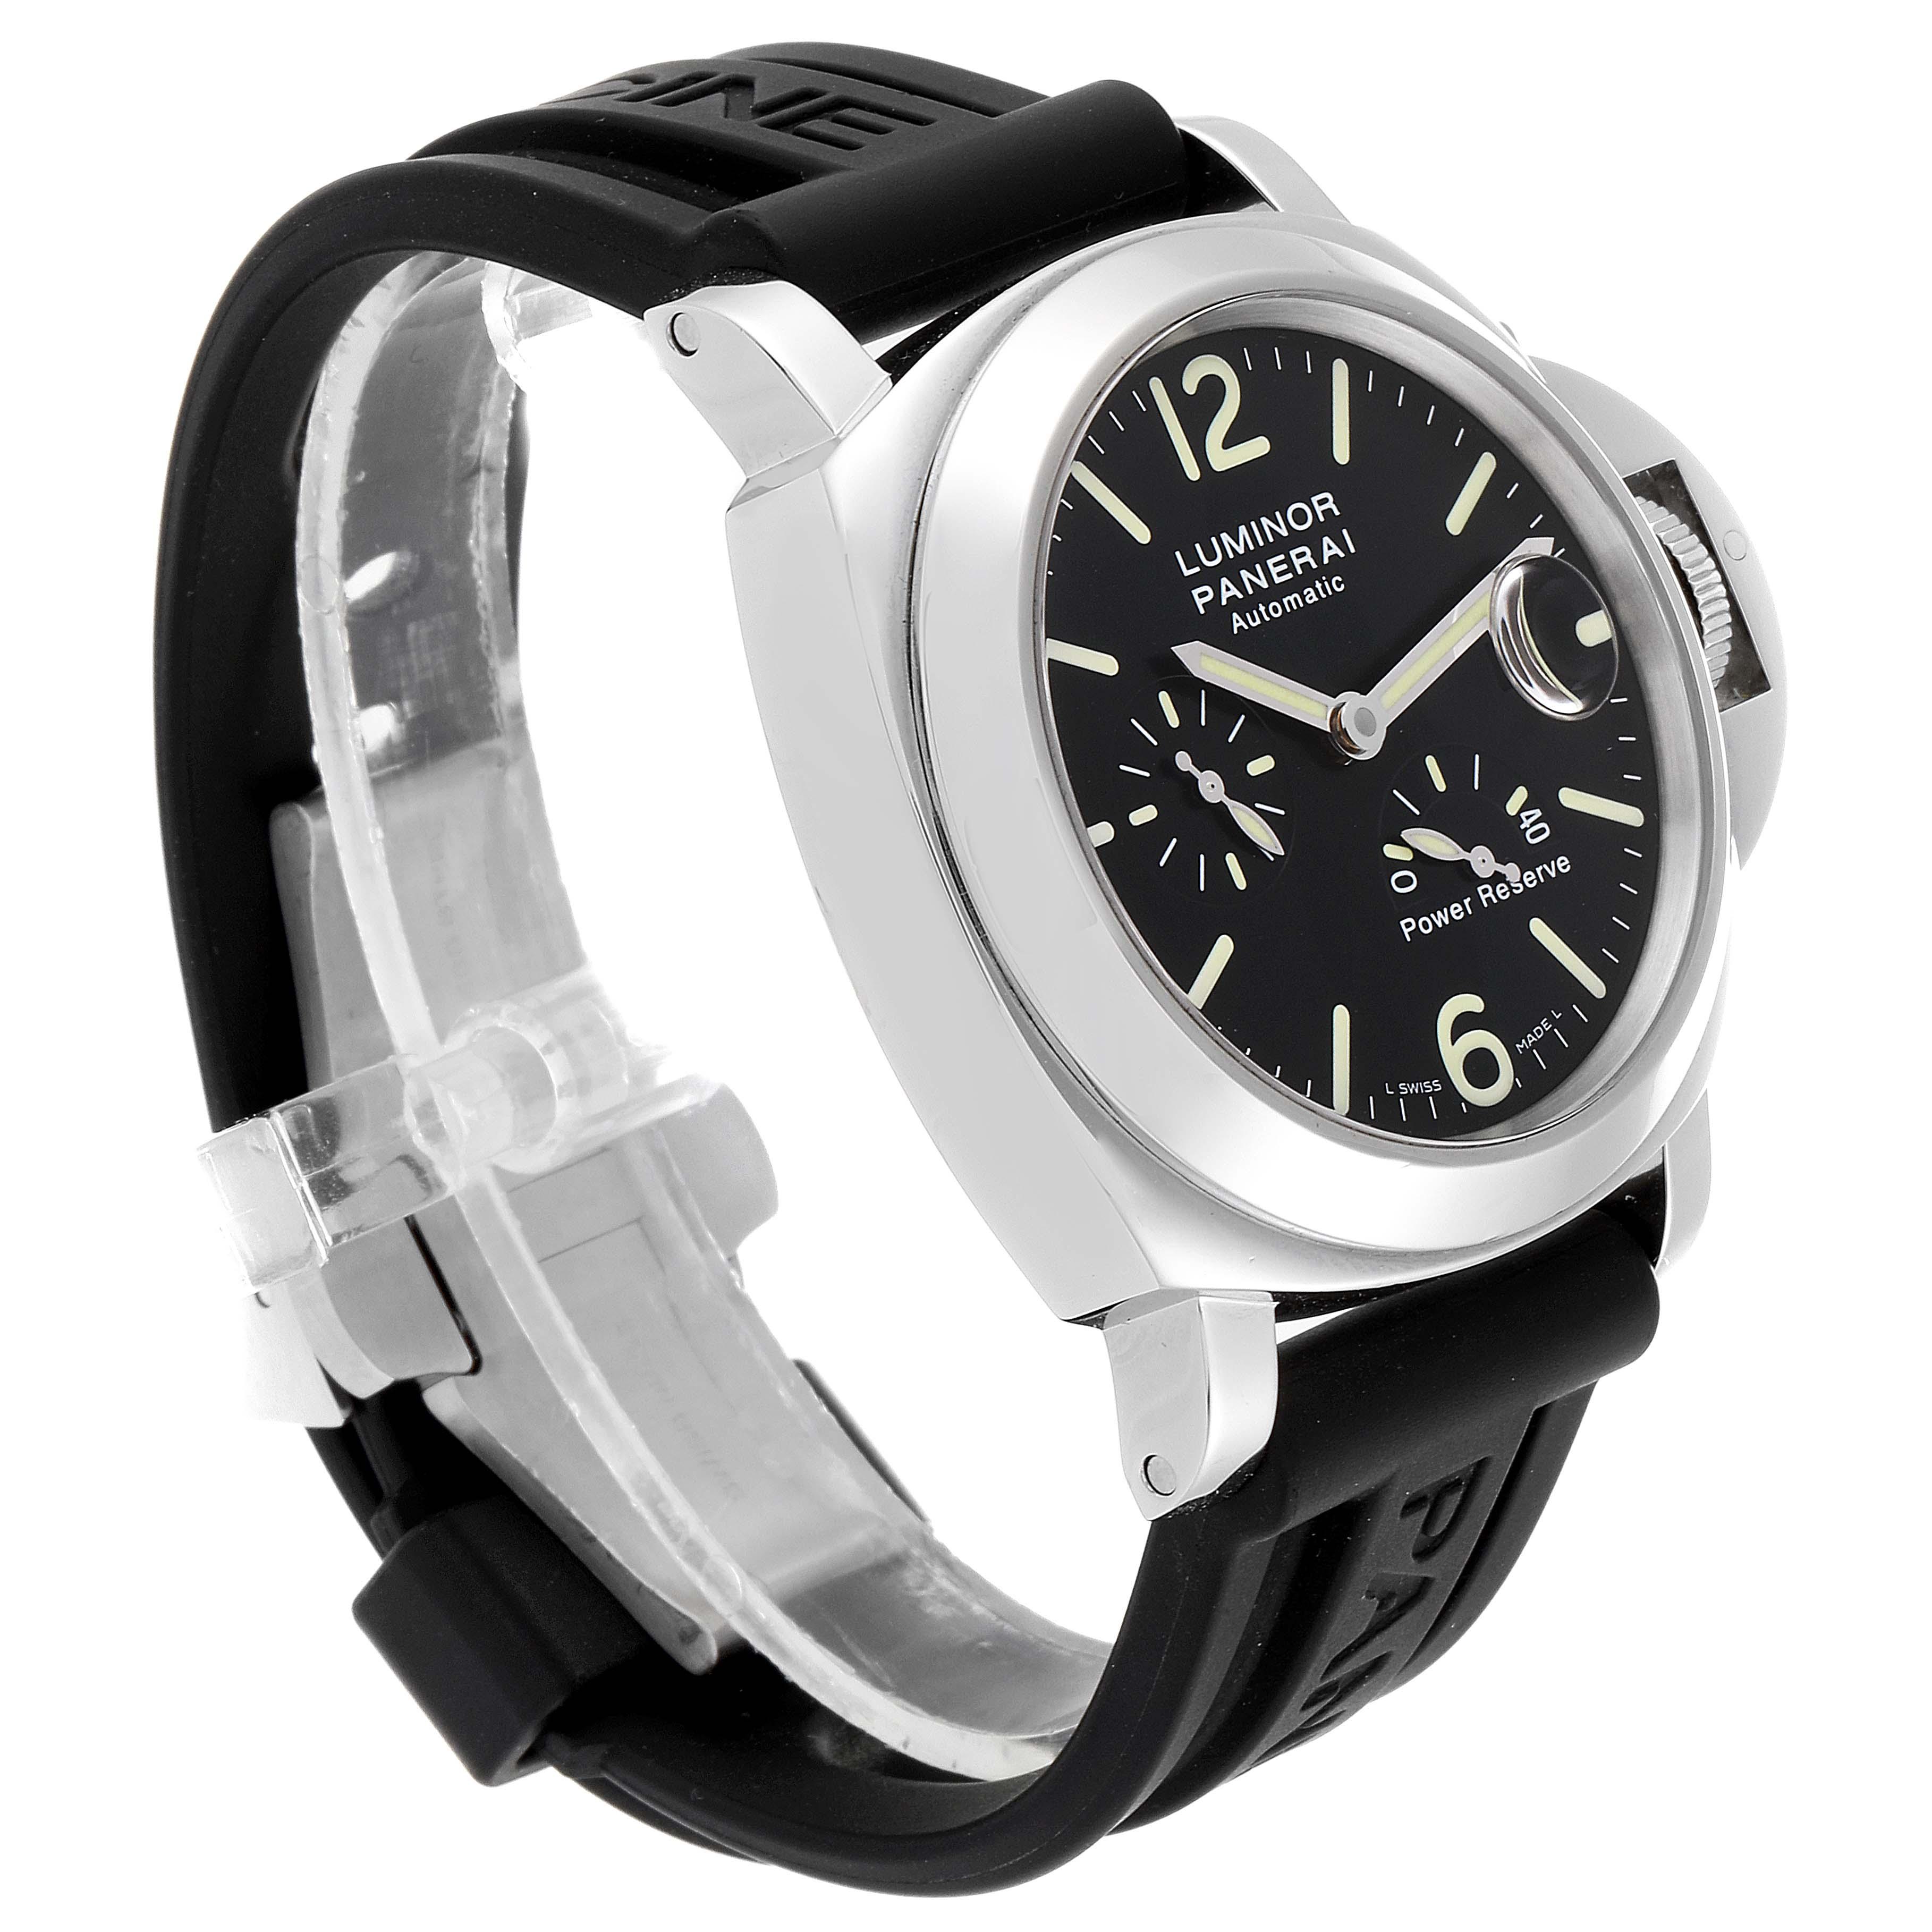 Panerai Luminor Power Reserve Automatic Mens Watch PAM00090 Box Papers SwissWatchExpo